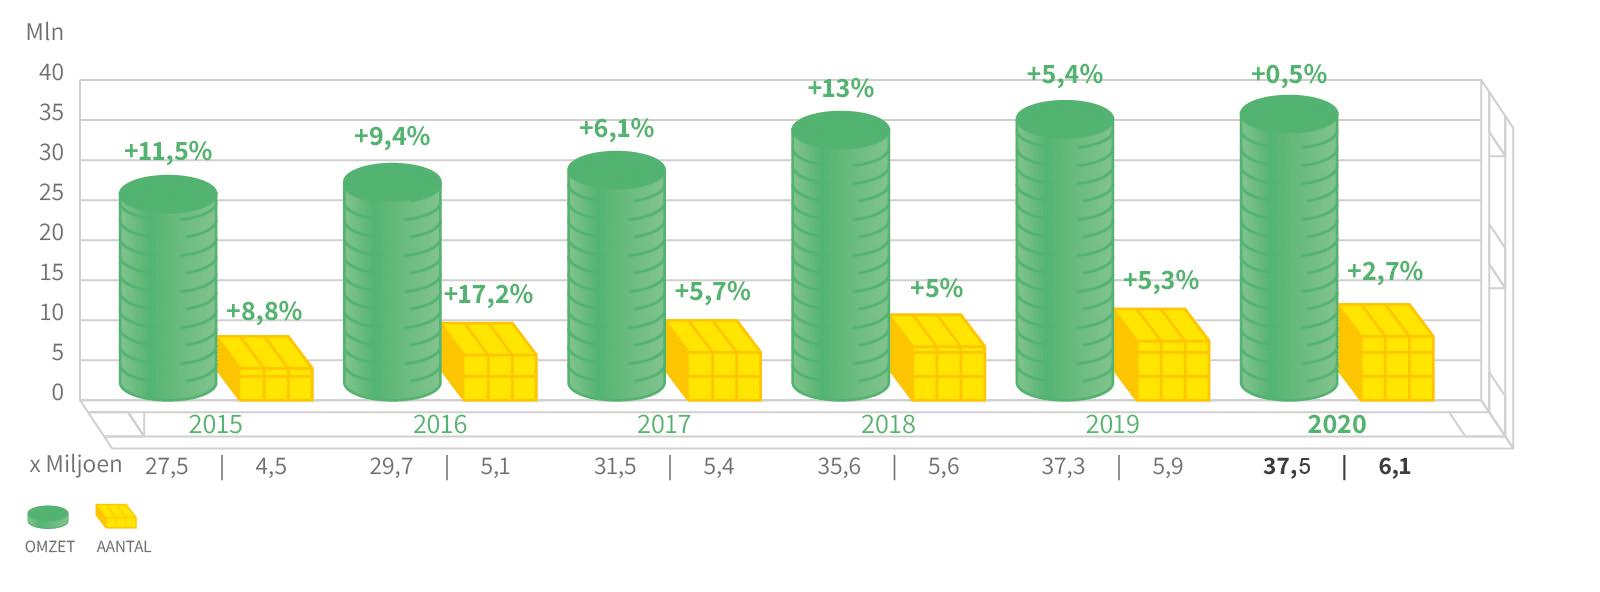 Palletcentrale-grafiek-2020